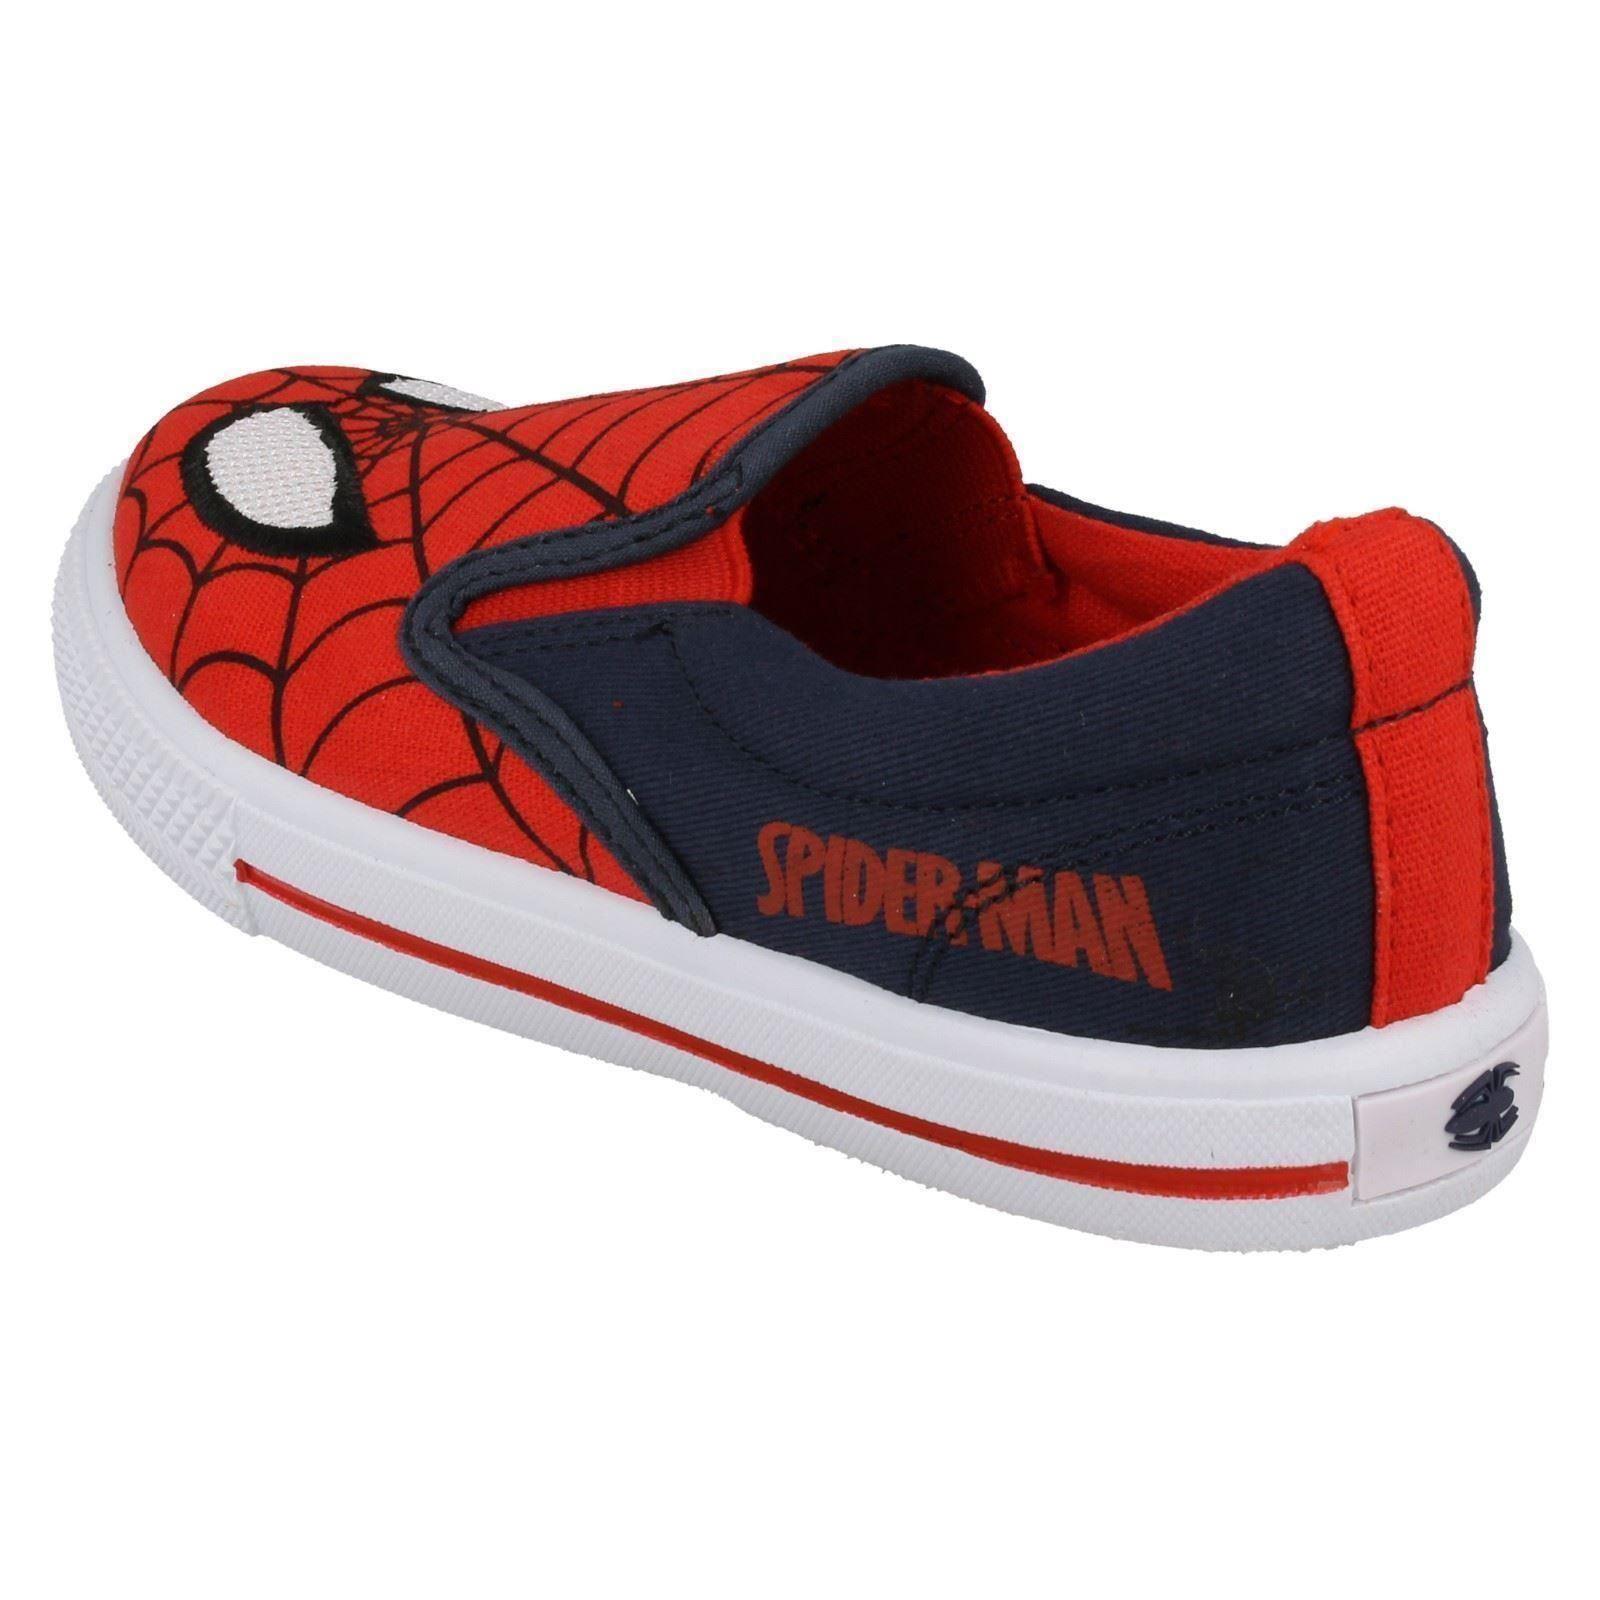 Shoe Size Bcd